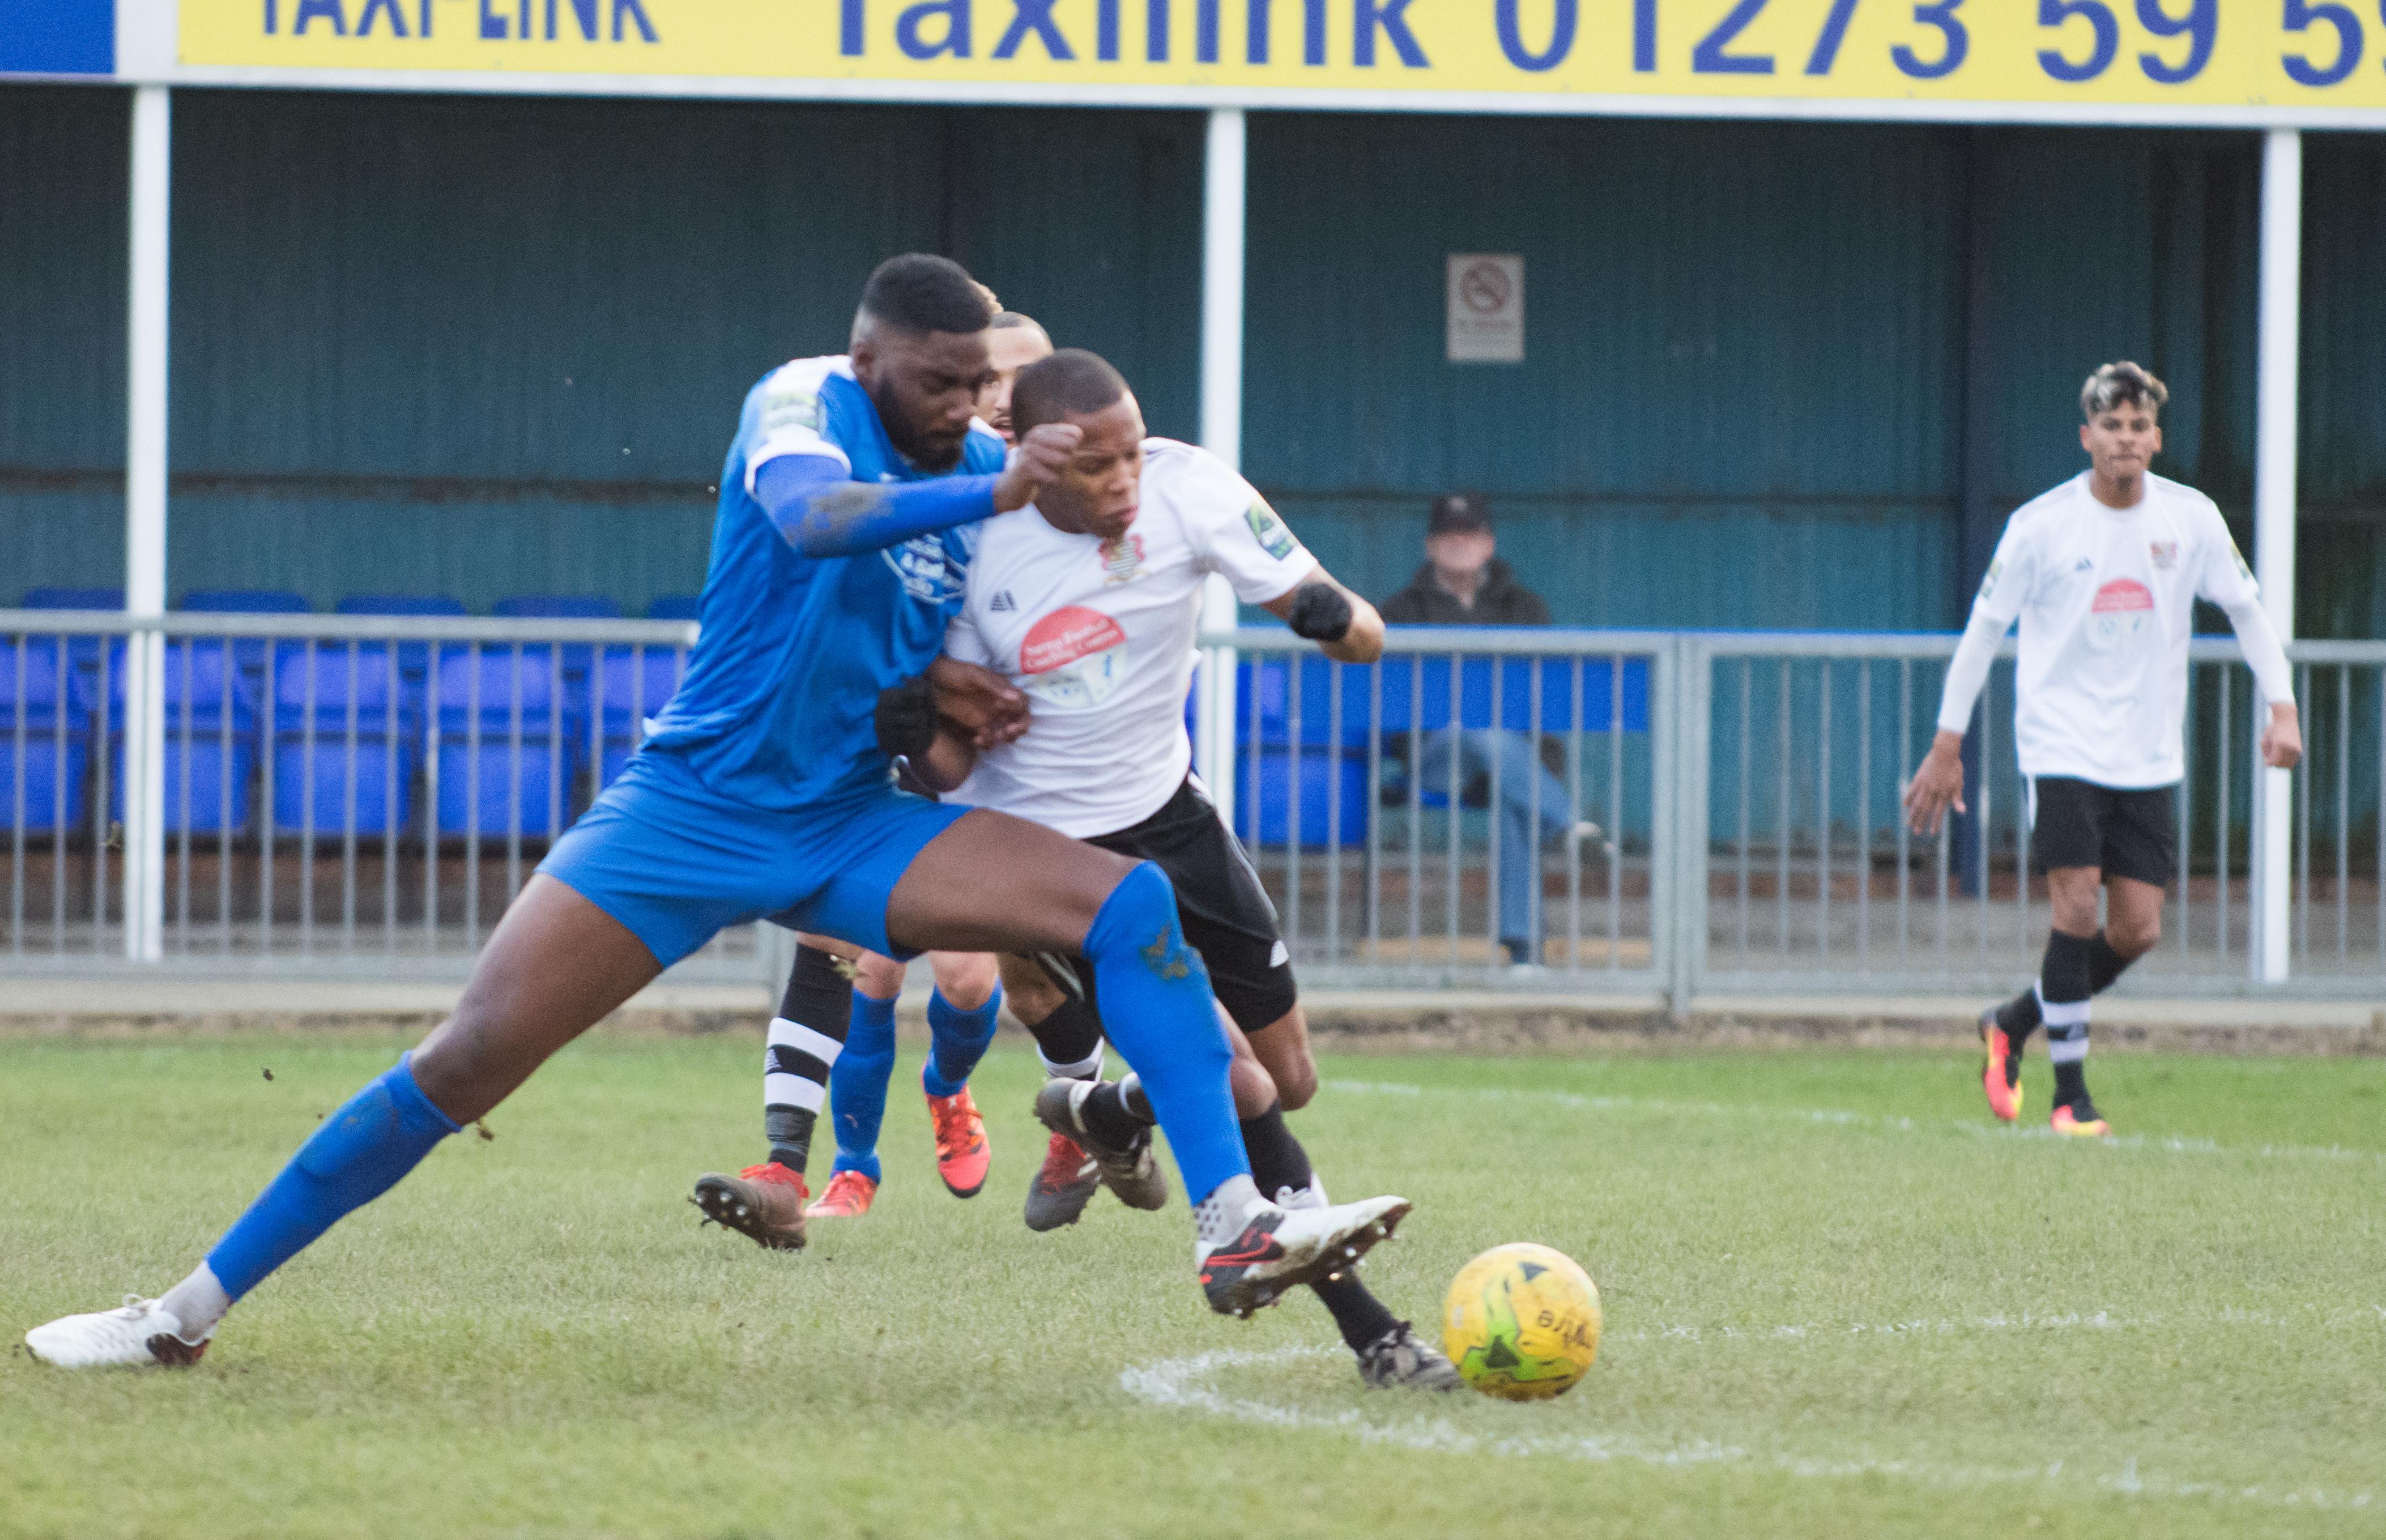 Shoreham FC vs Molesey FC 02.12.17 60